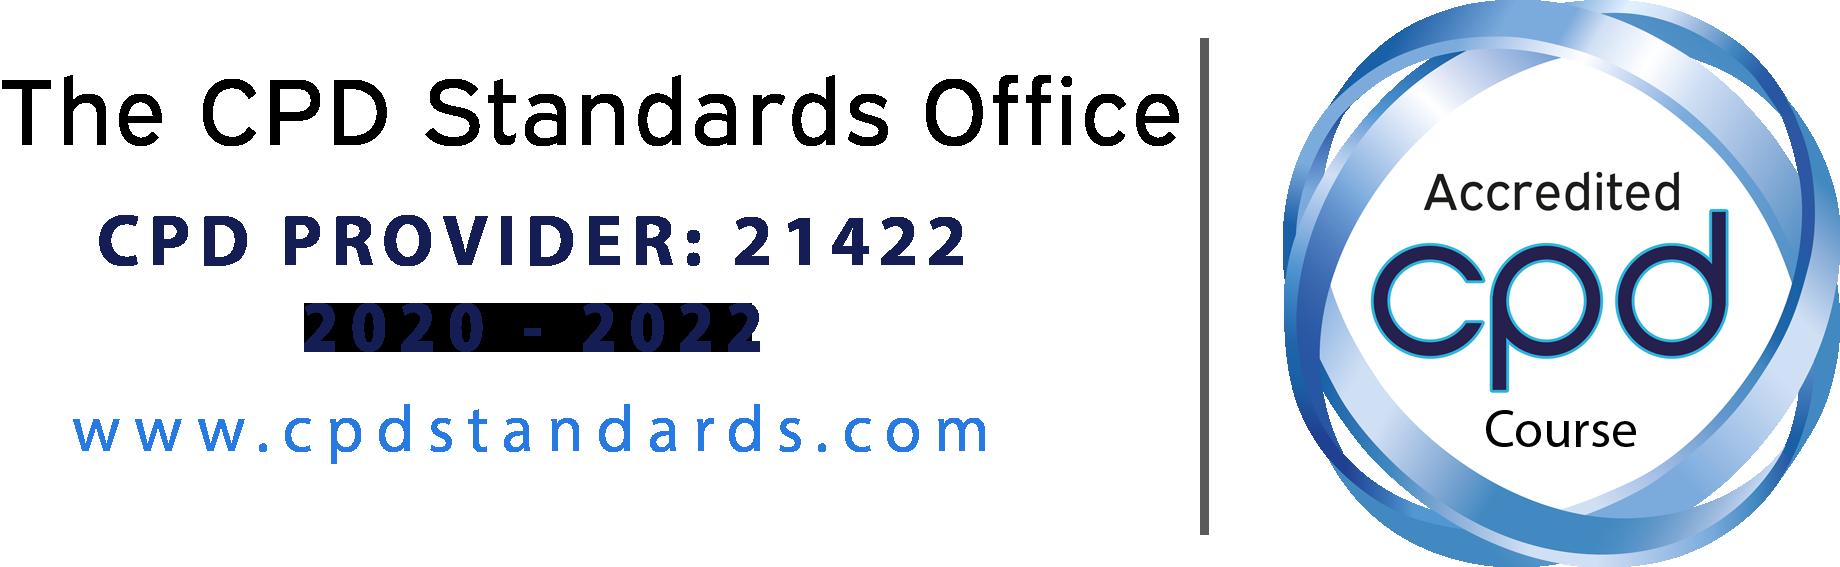 CPD Course NORDIC COACH & NLP ACADEMY 21422 -